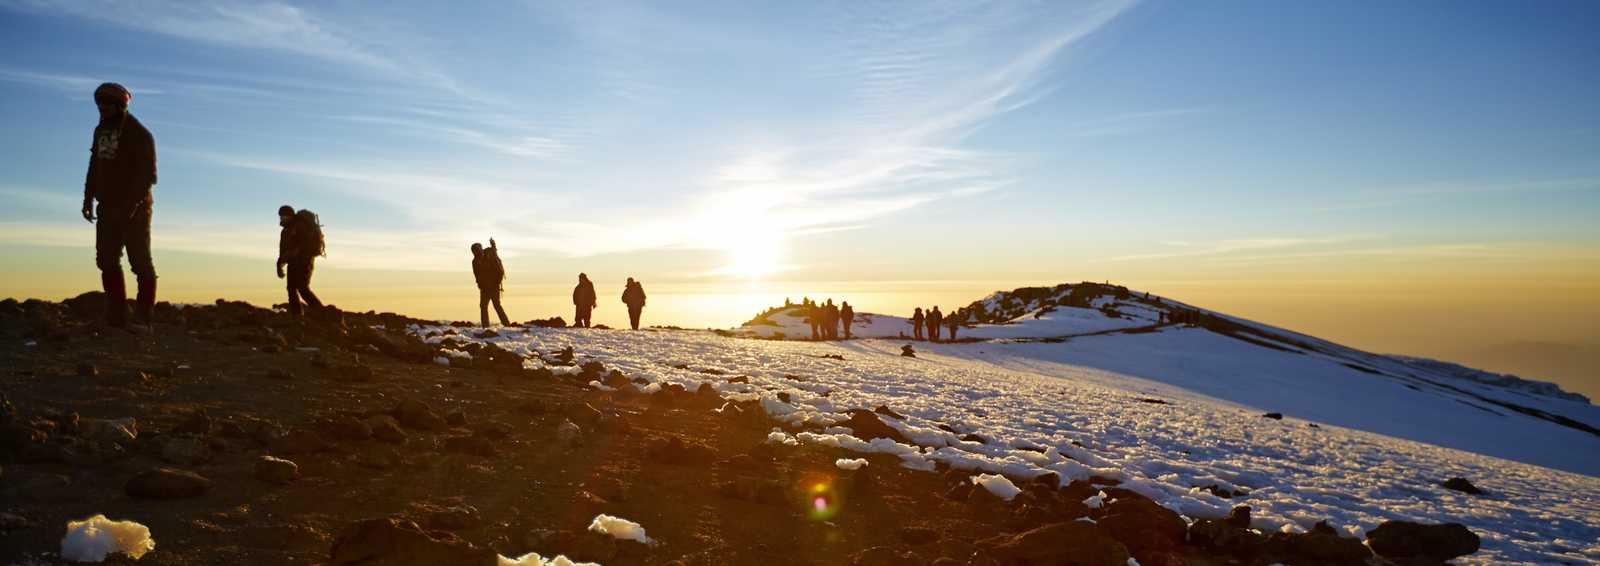 Trekkers on Kilimanjaro